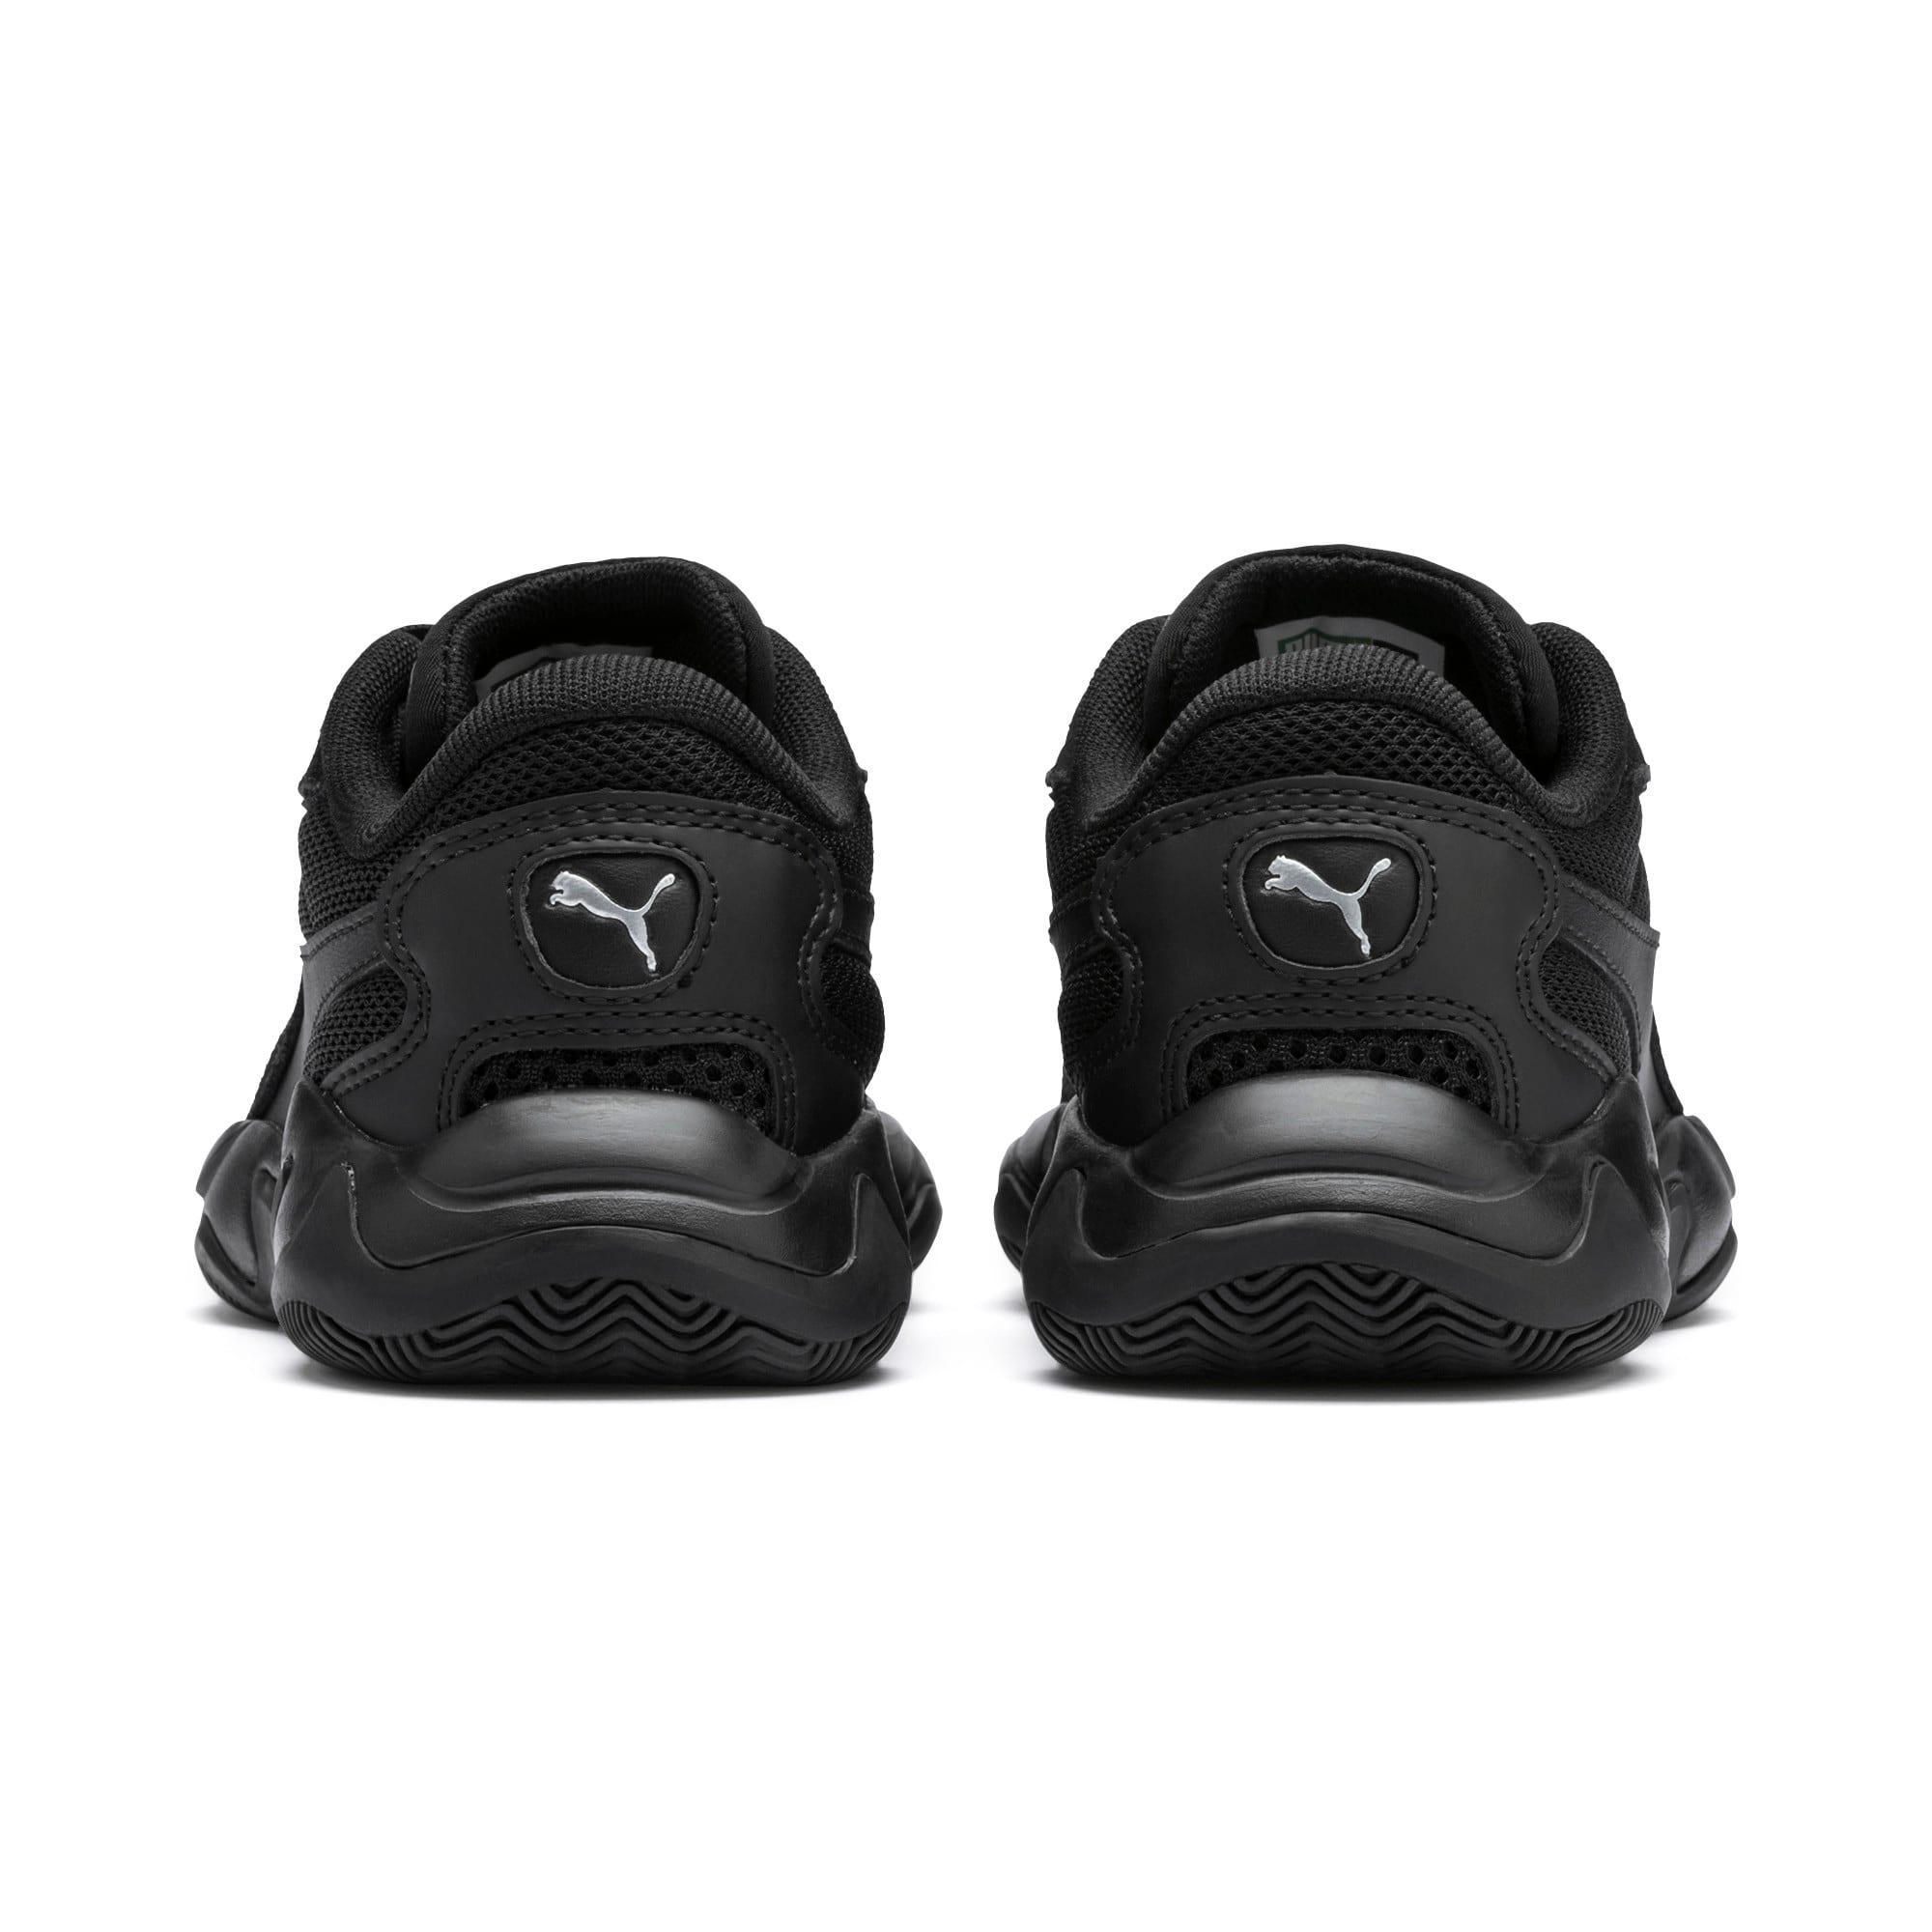 Thumbnail 3 of Storm Origin Little Kids' Shoes, Puma Black, medium